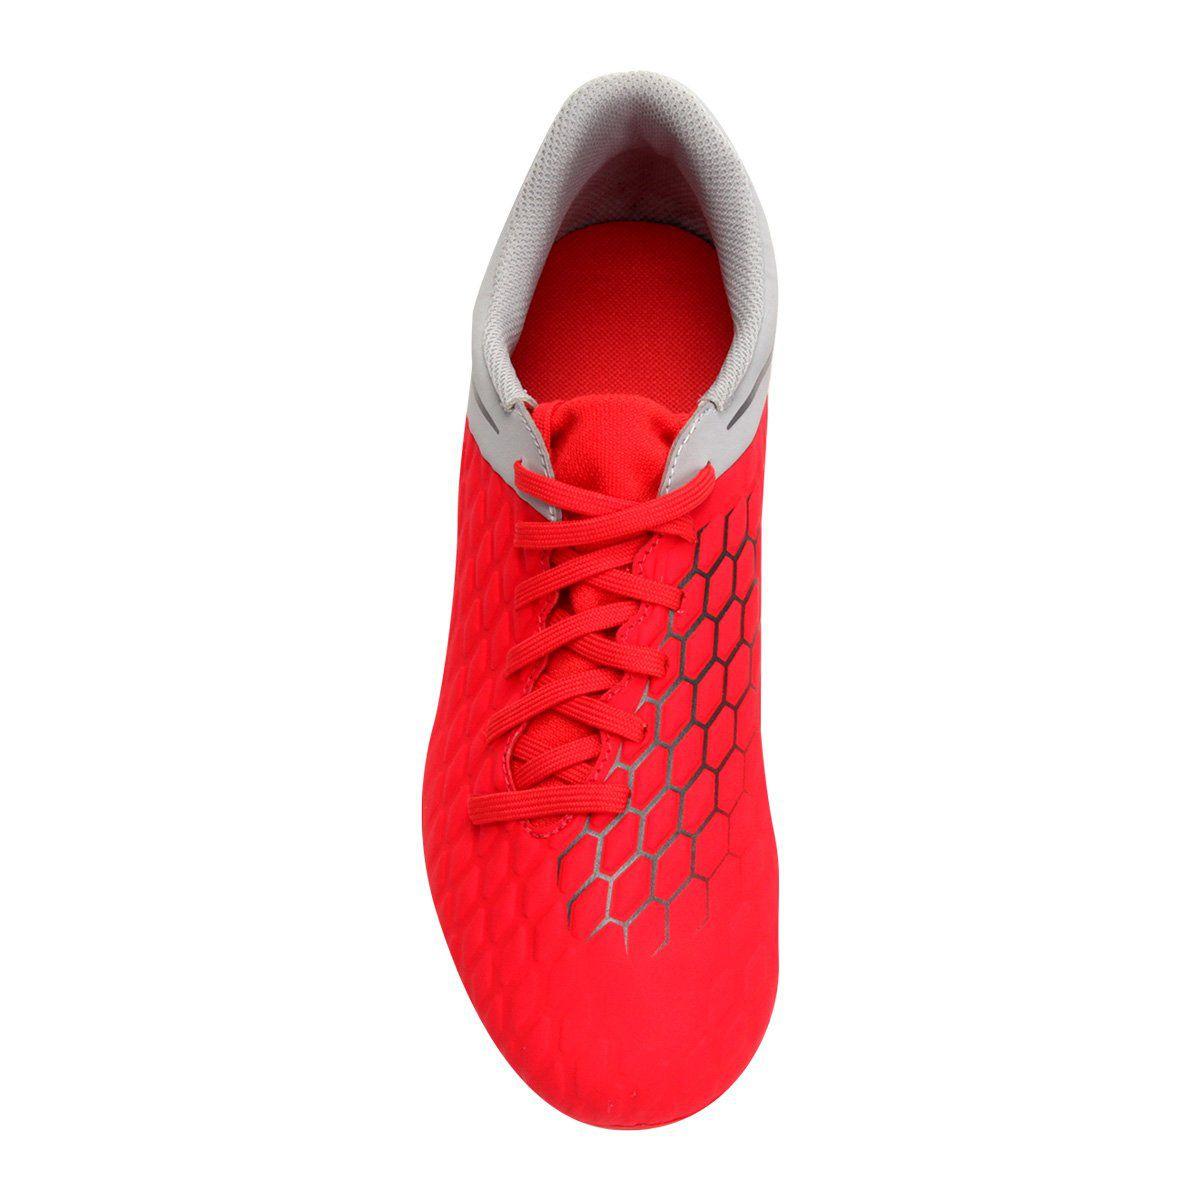 Chuteira Campo Nike Hypervenom Phantom 3 Club FG